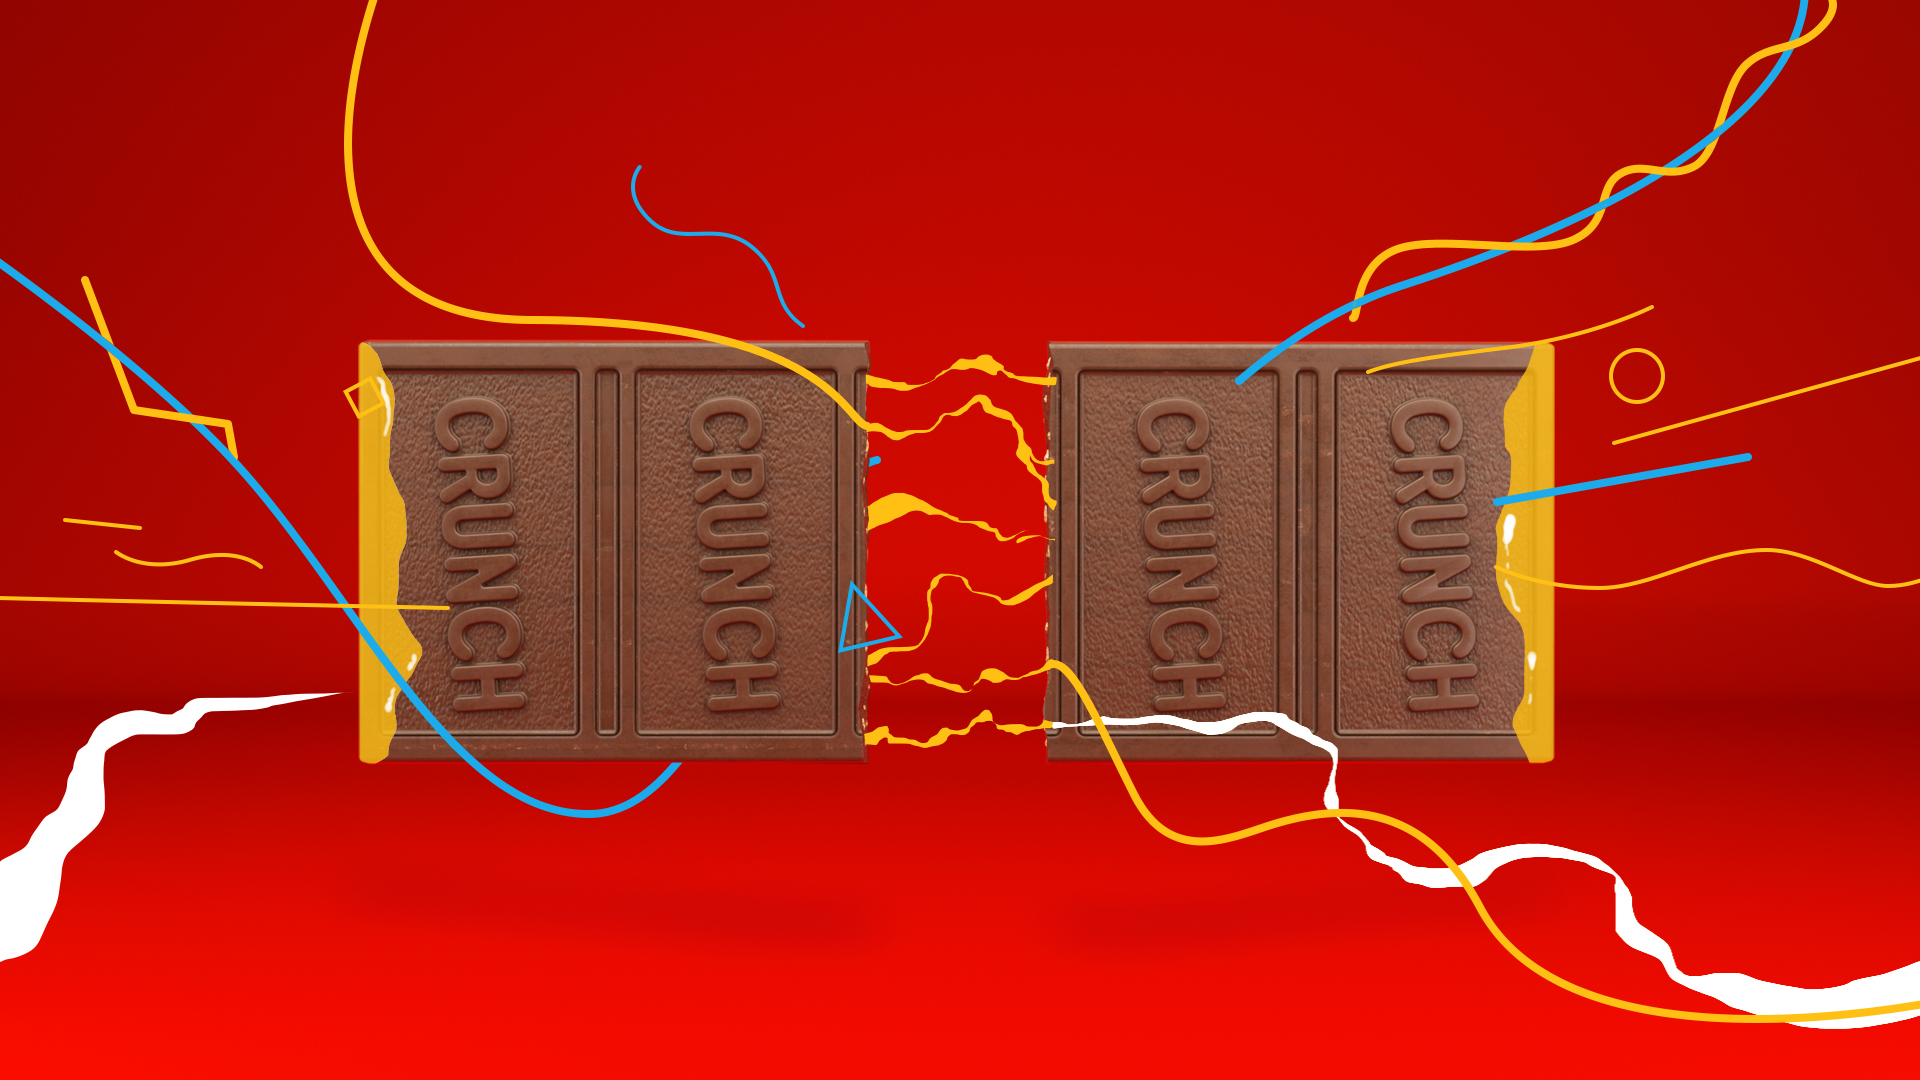 NestleCrunch_H01_V02.jpg